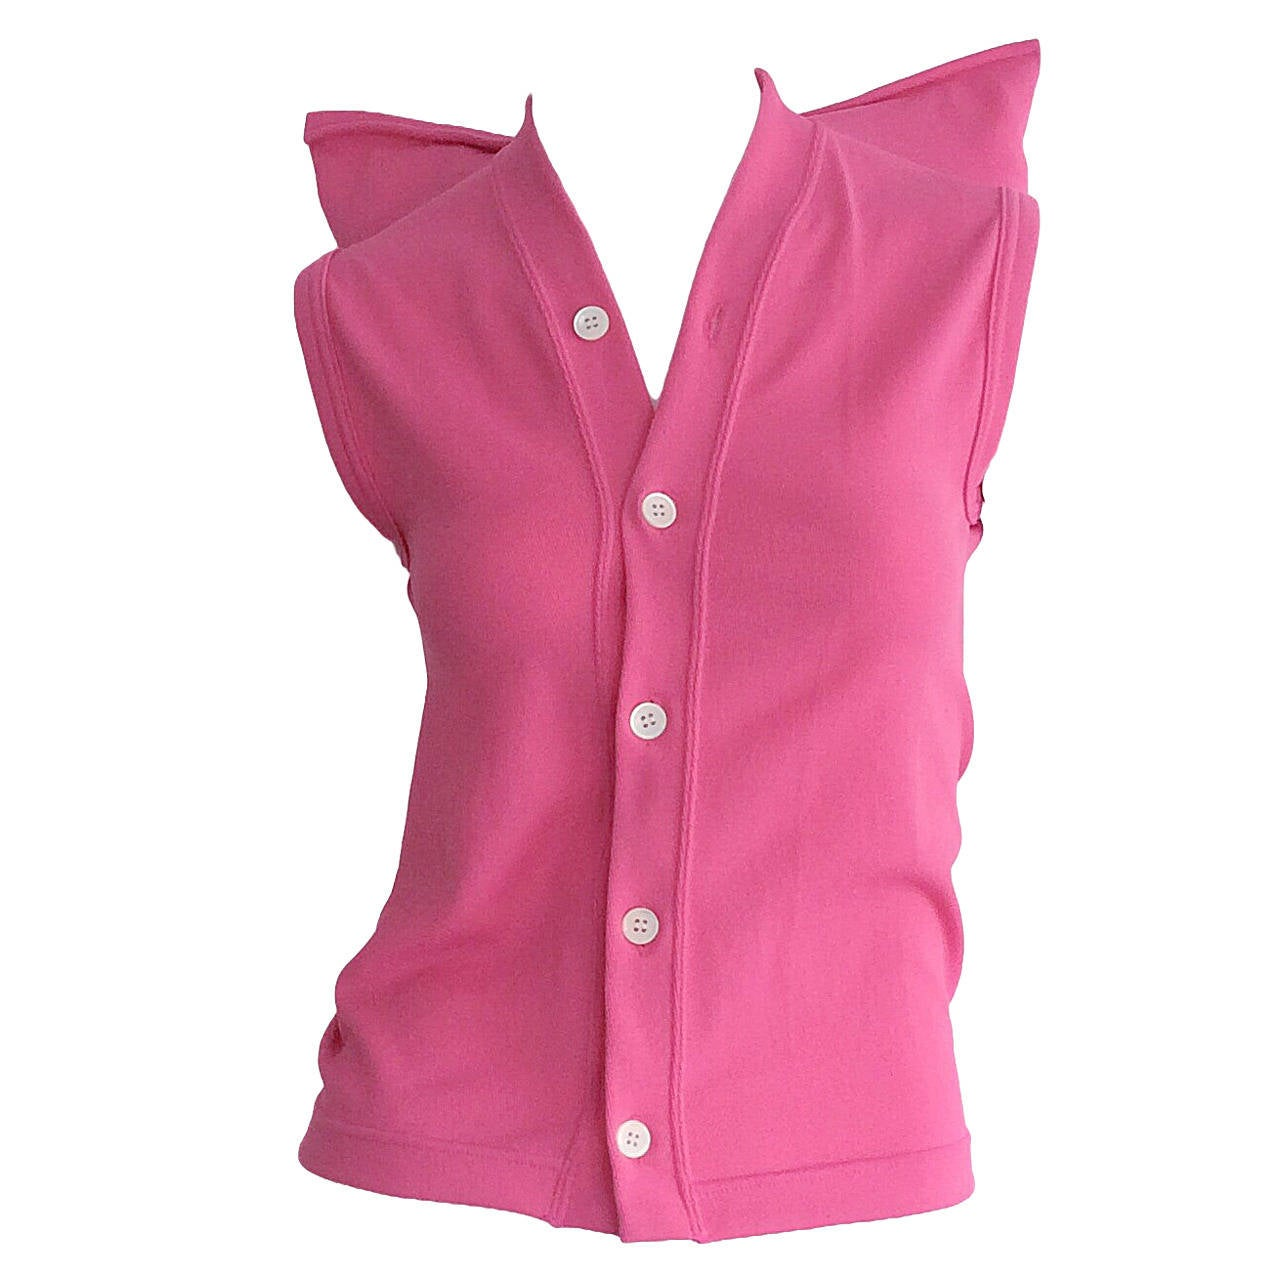 1990s Vintage Comme des Garcons Hot Pink ' Judy Jetson ' Shirt Blouse For Sale